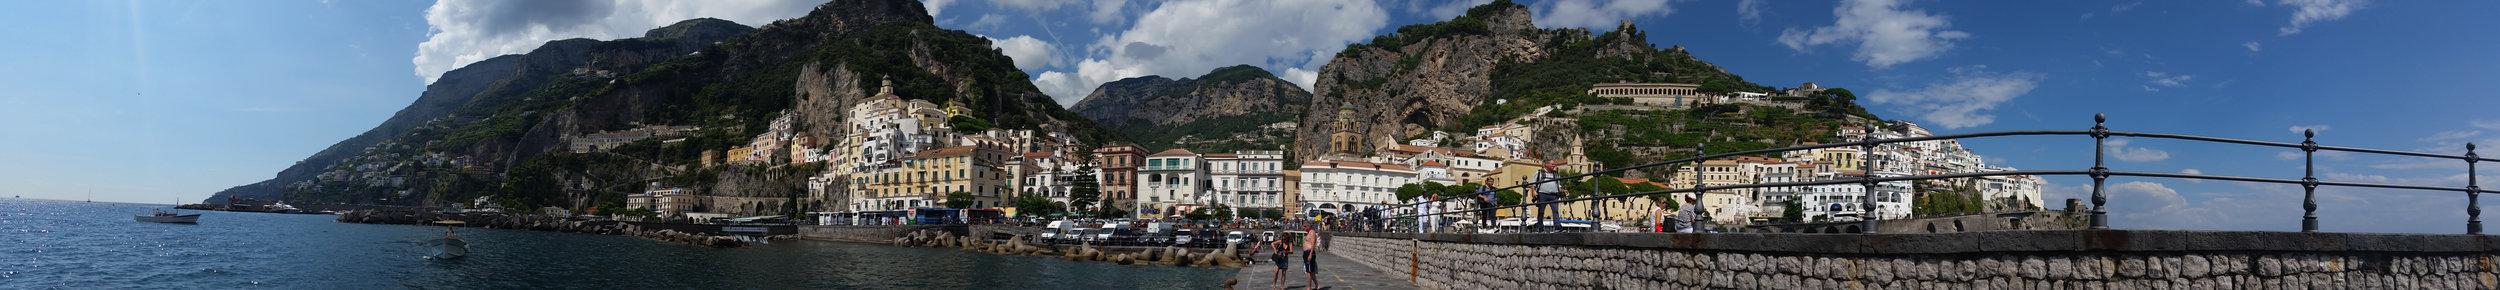 Amalfi coast panoramic.jpg